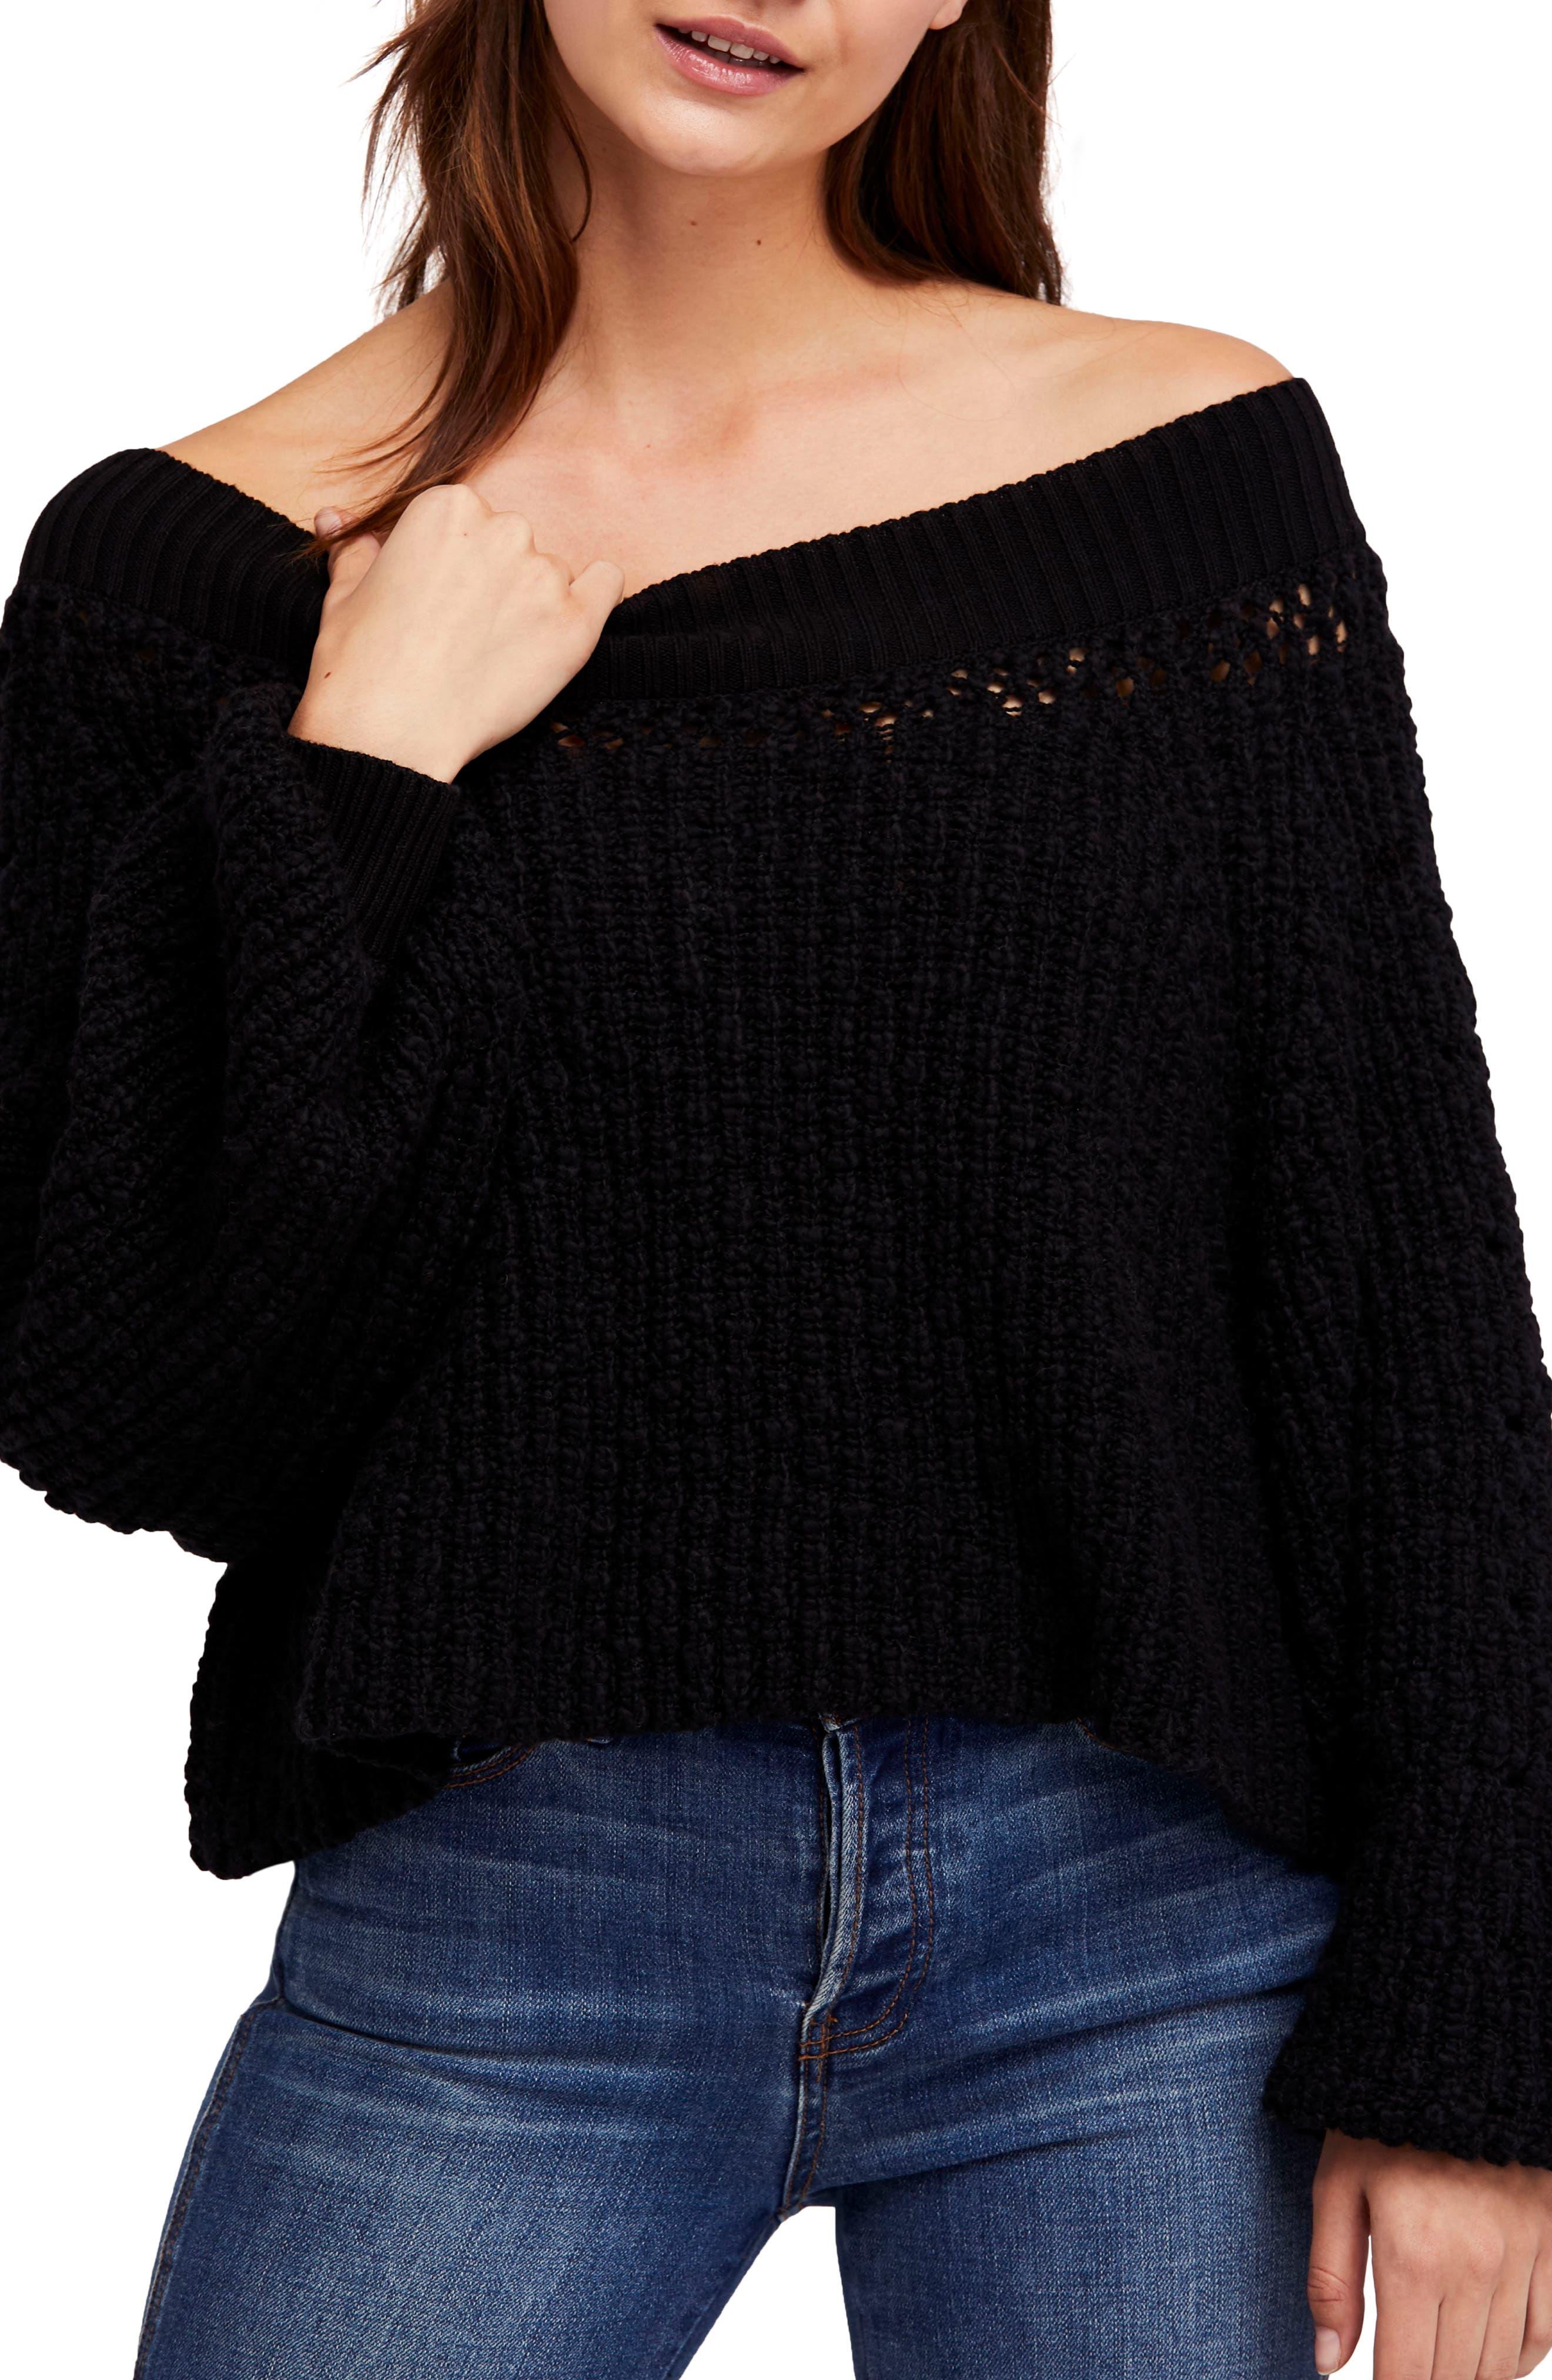 Pandora's Boatneck Sweater,                         Main,                         color, Black